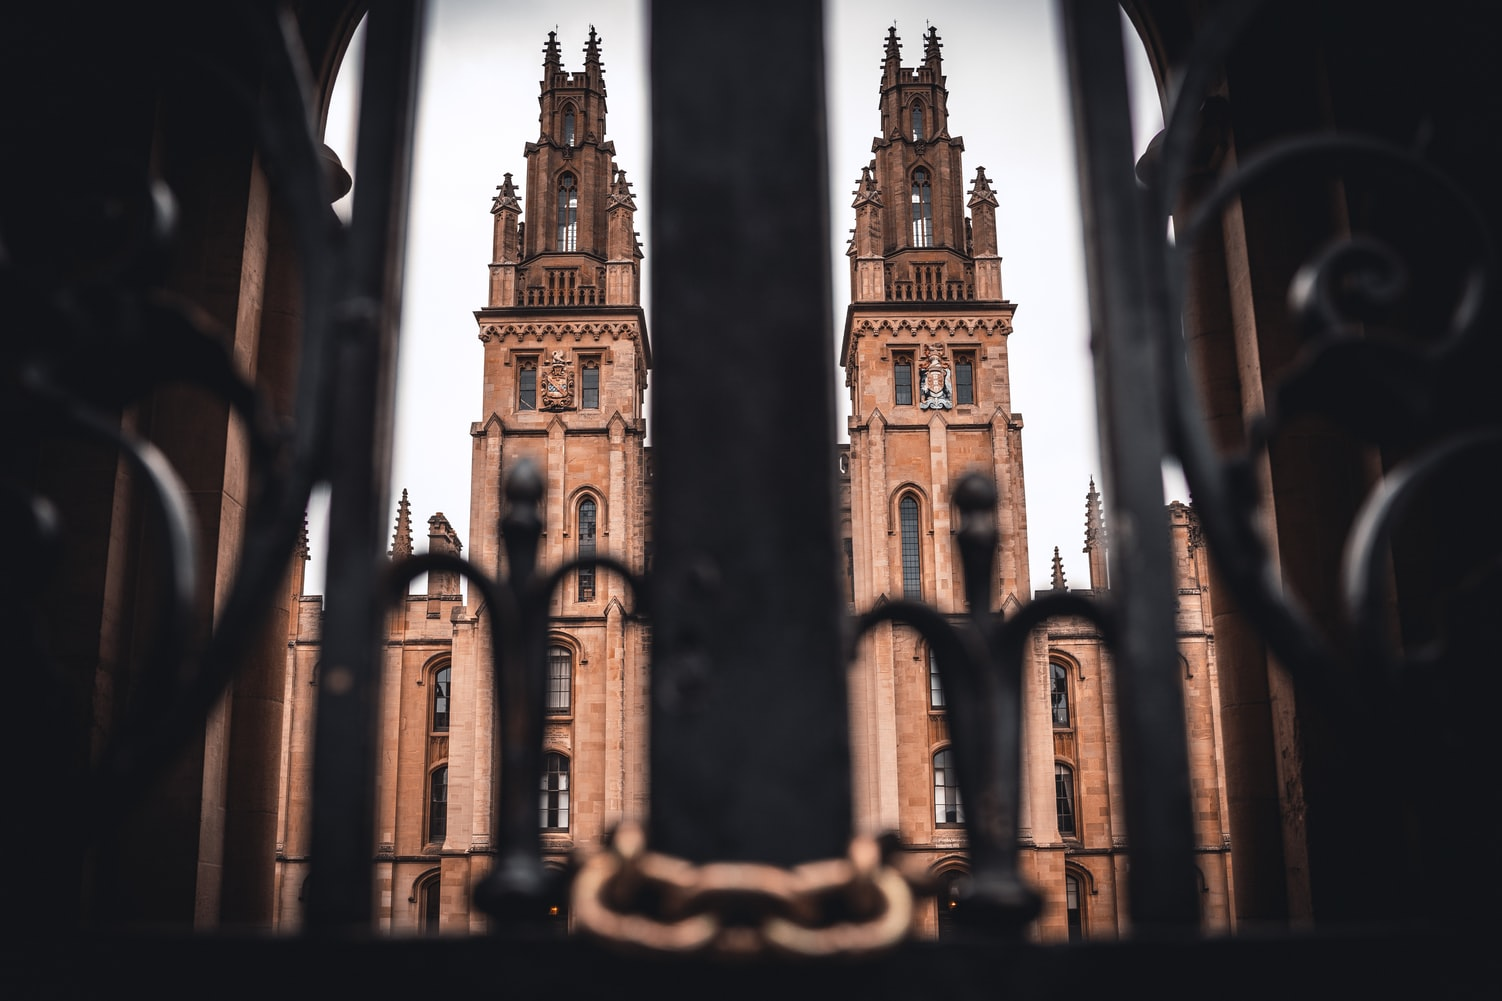 All souls college seen through a gate